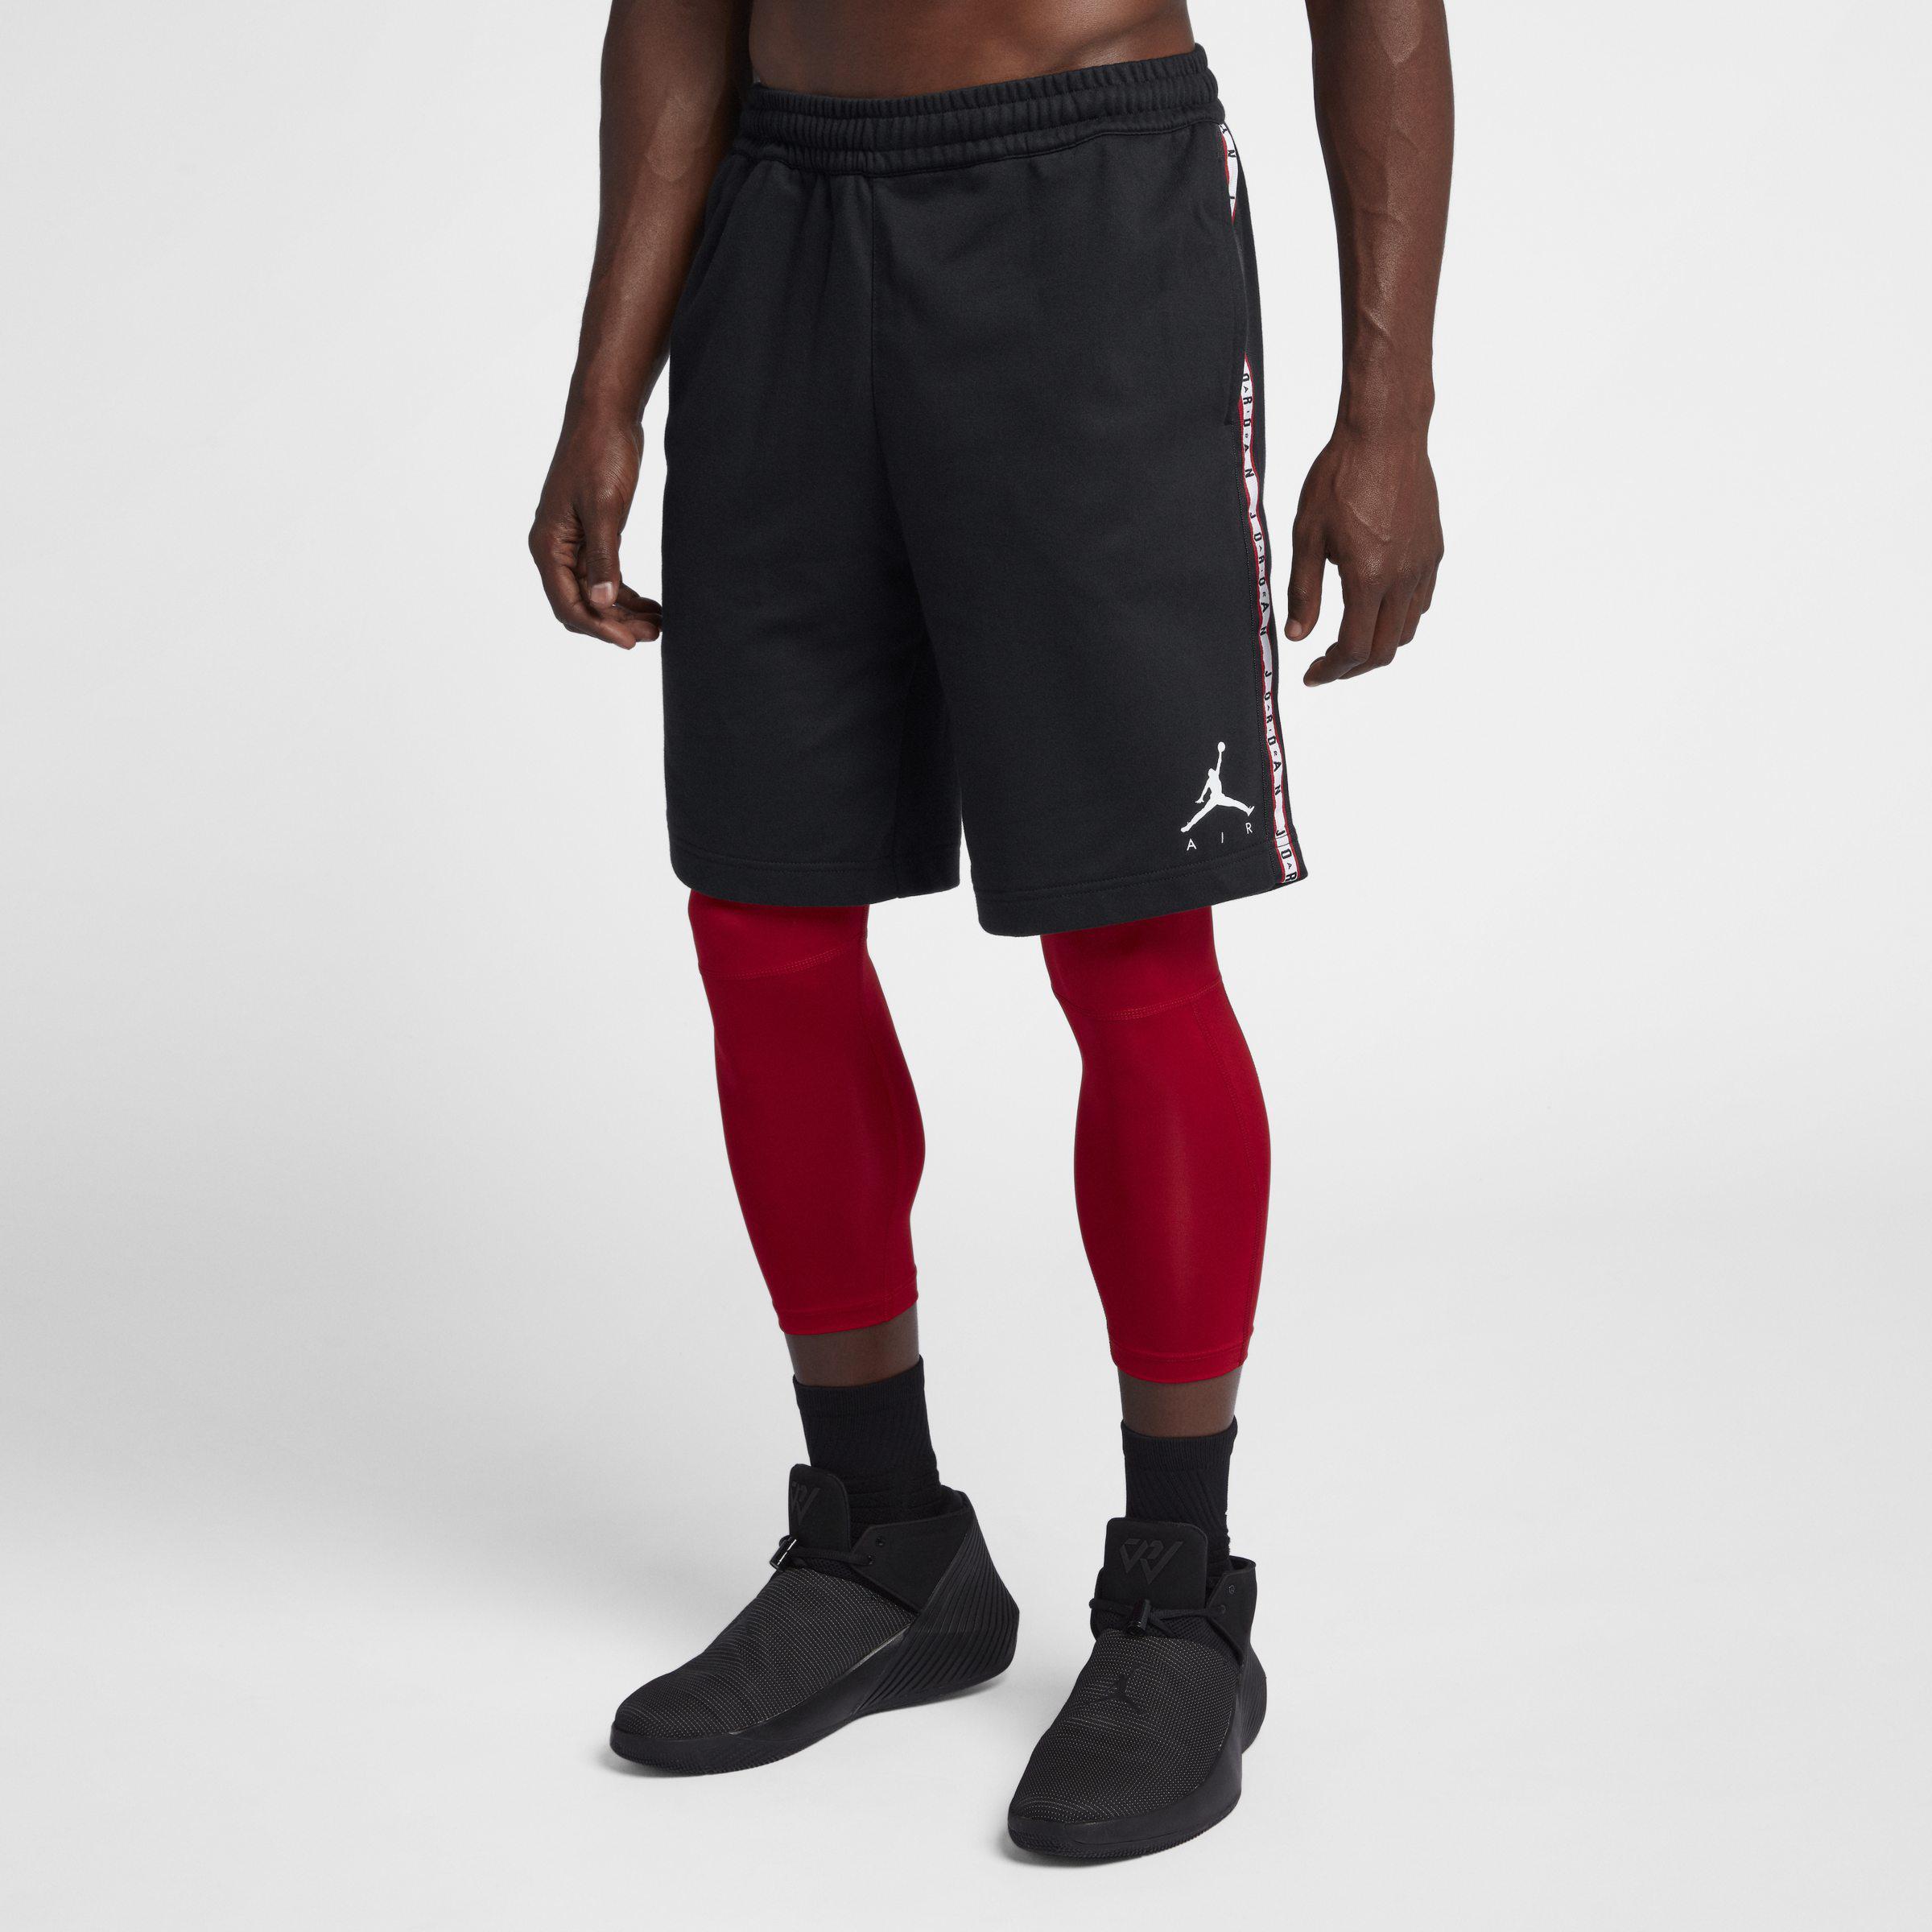 1ffb035c186 Nike Air Jordan Hbr Fleece Shorts in Black for Men - Lyst